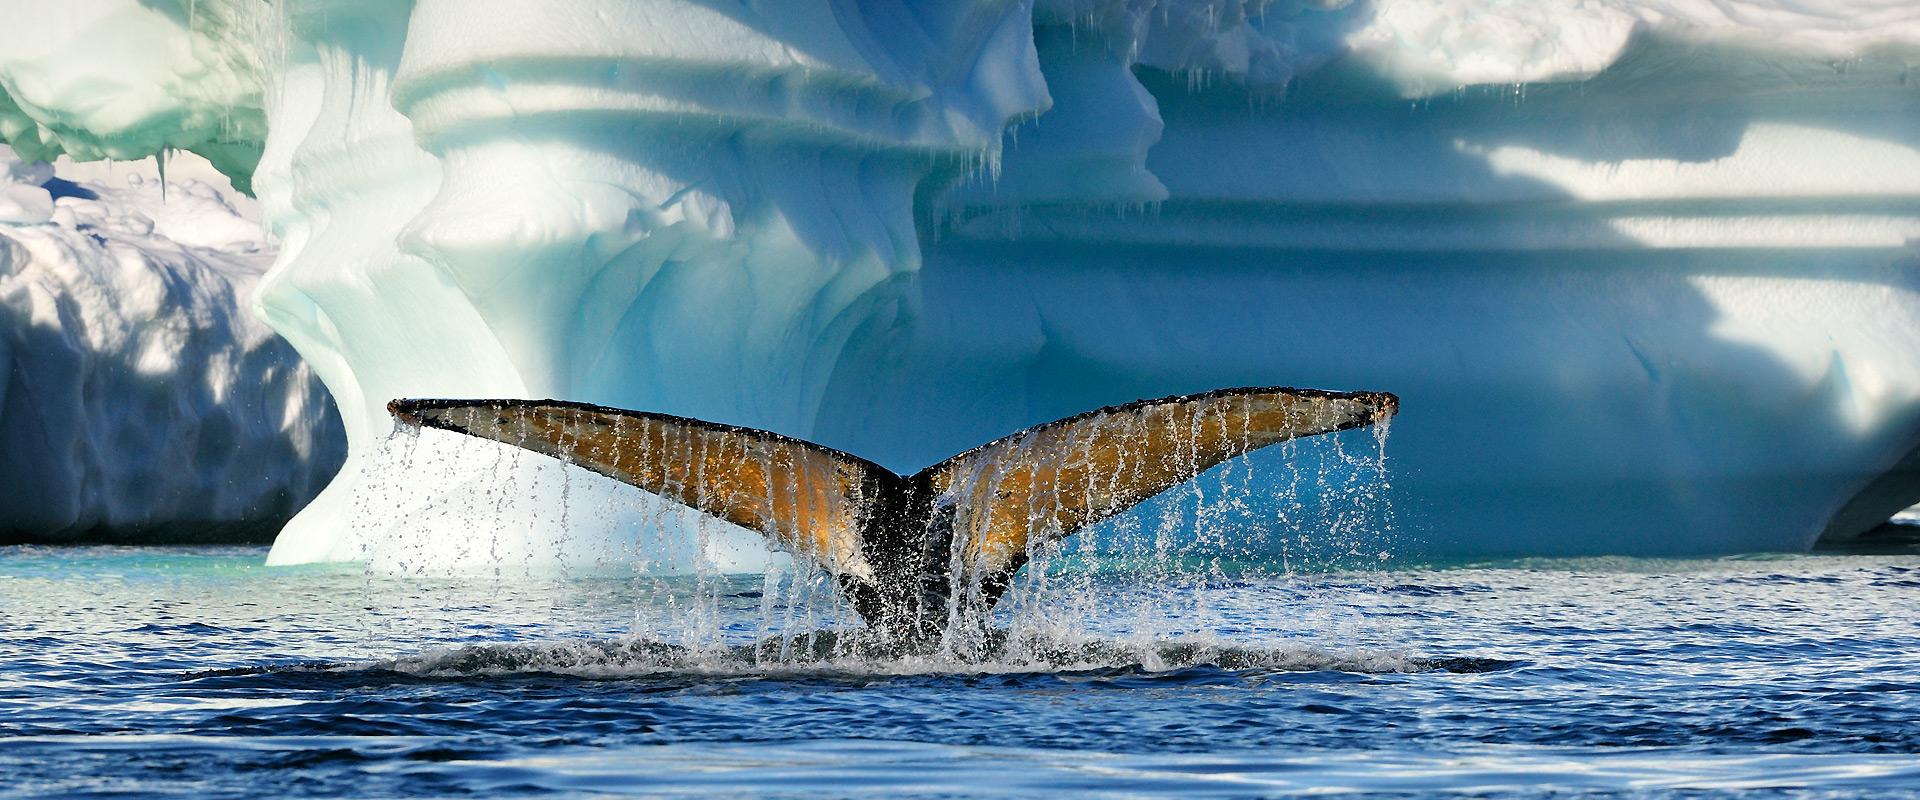 Buckelwal bei Cuverville Island, Antarktische Halbinsel